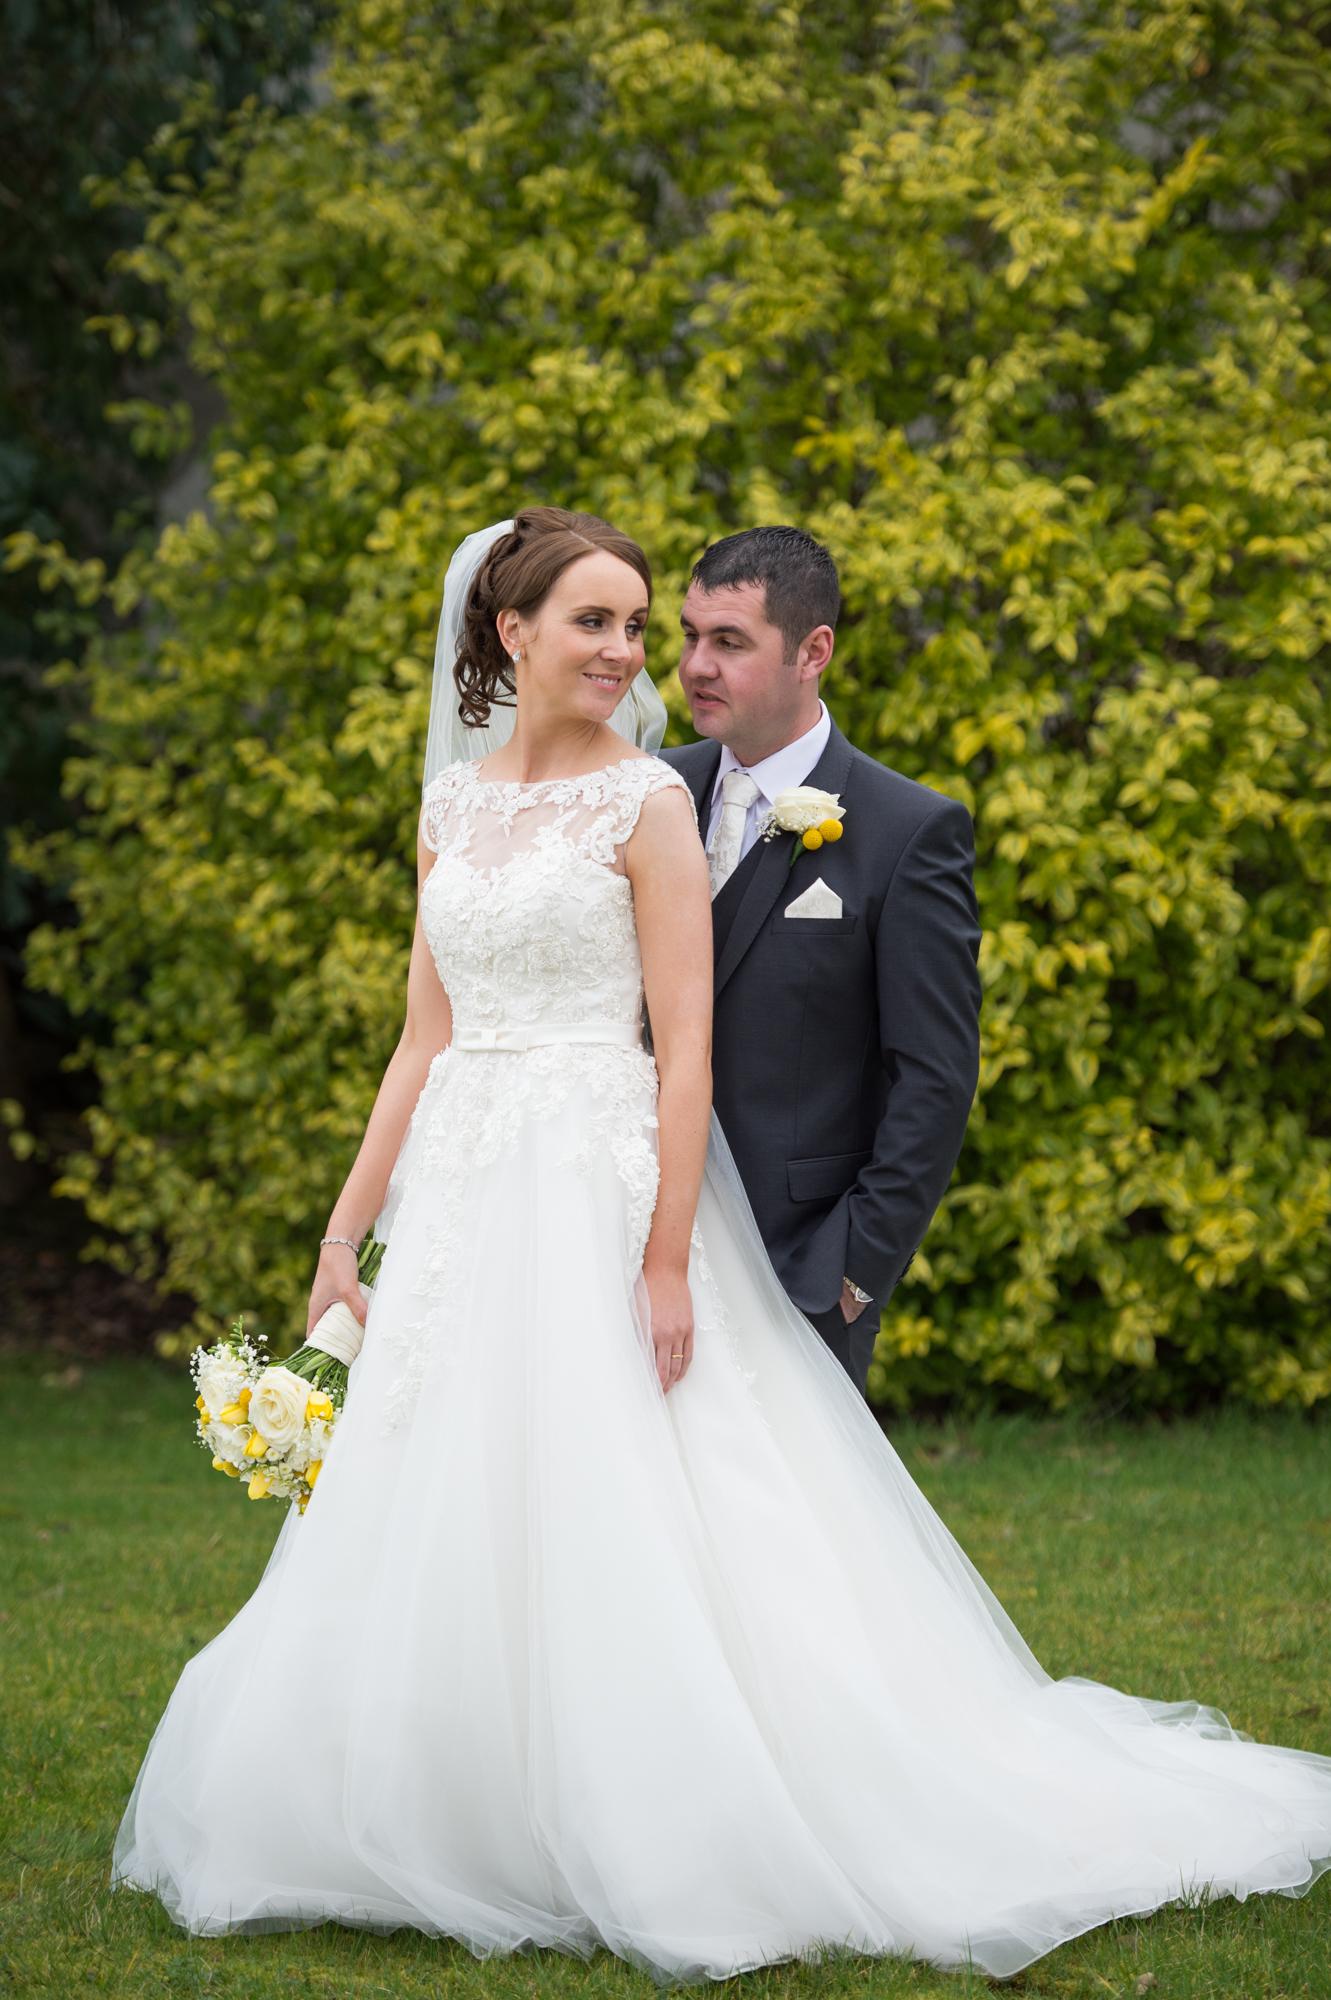 Michael_Gill_Photography_Wedding_Greencastle_Lousie_Jason_Donegal-14.jpg